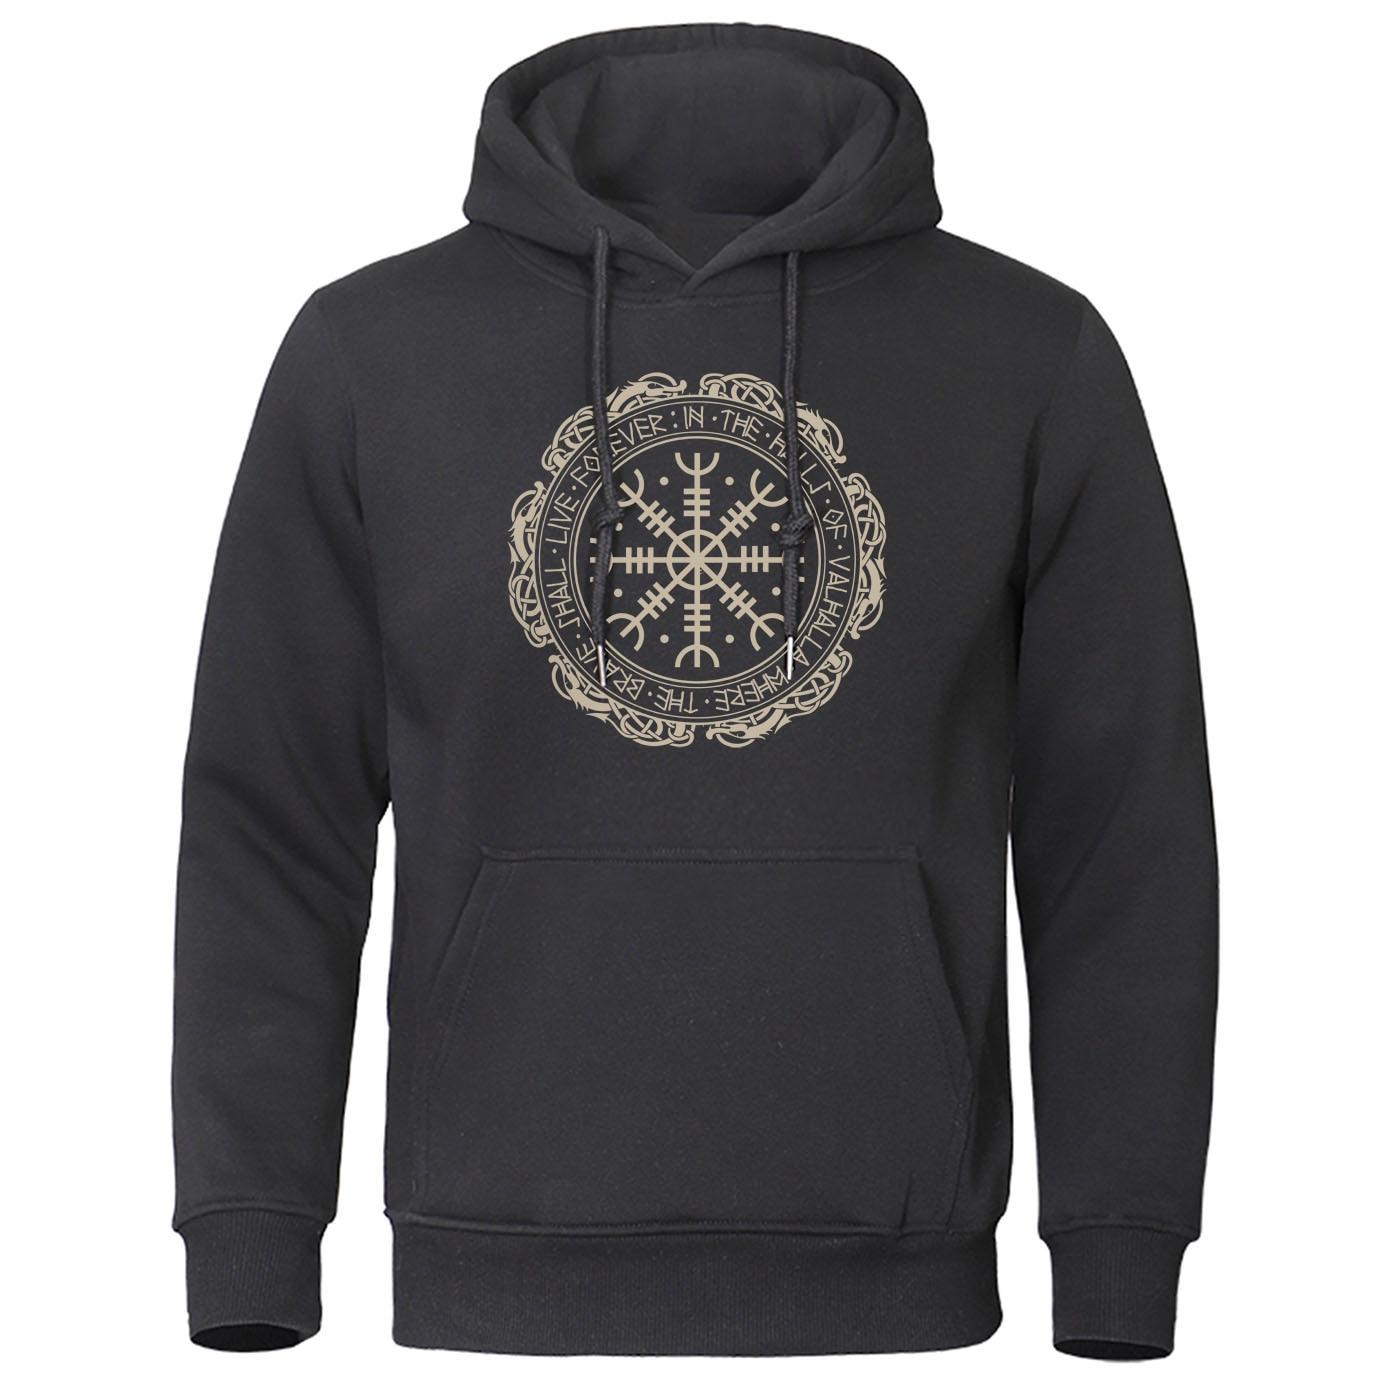 2019 Retro Classic Viking Valhalla Odin Hoodie Men Fashion Print Hoodies Hip Hop Autumn Winter Sweatshirt Harajuku Streetwear